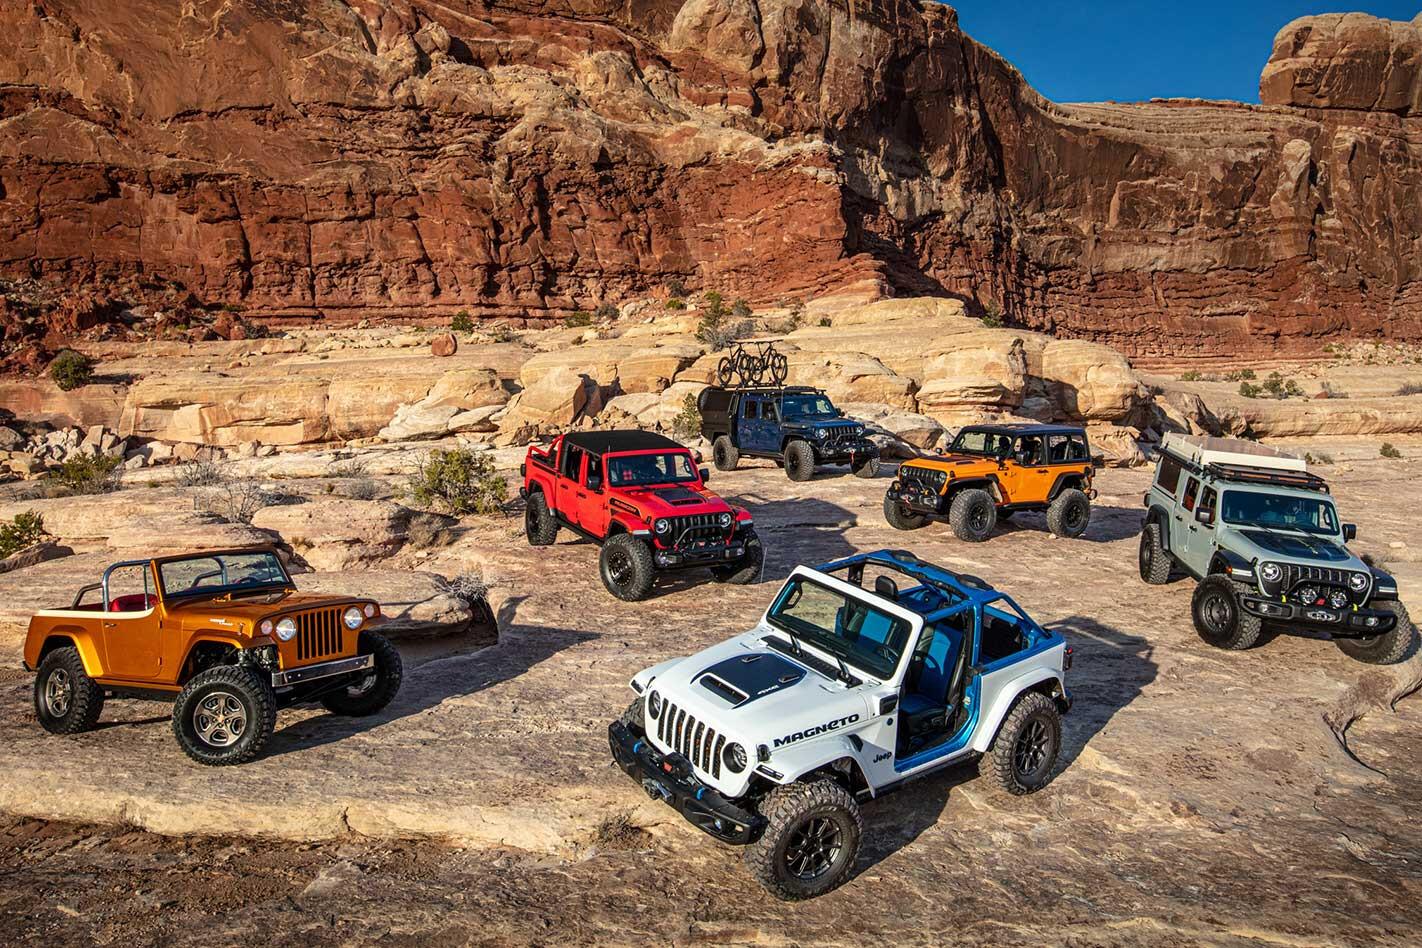 2021 Easter Jeep Safari concepts